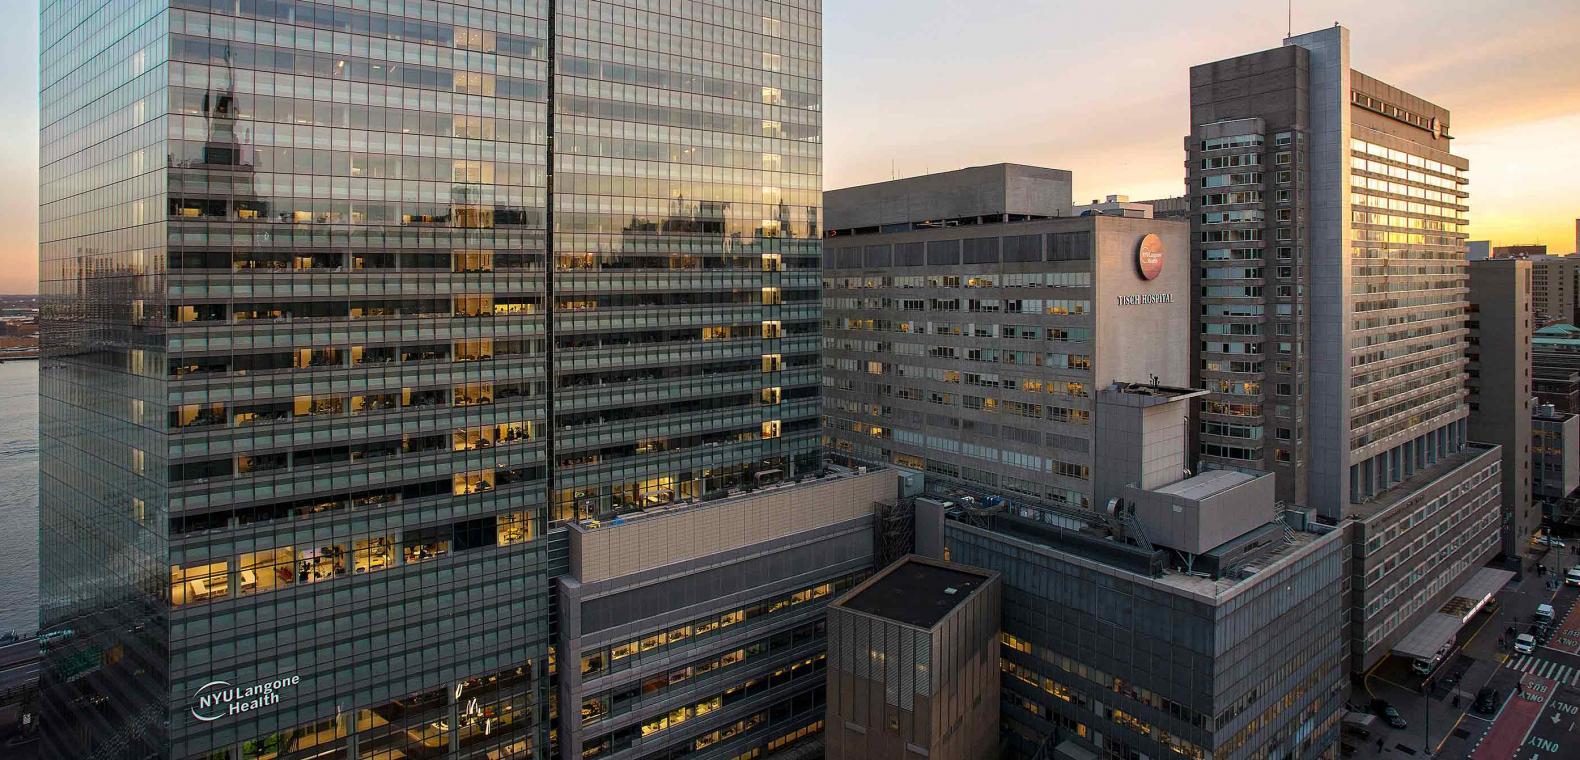 New York University Medical School